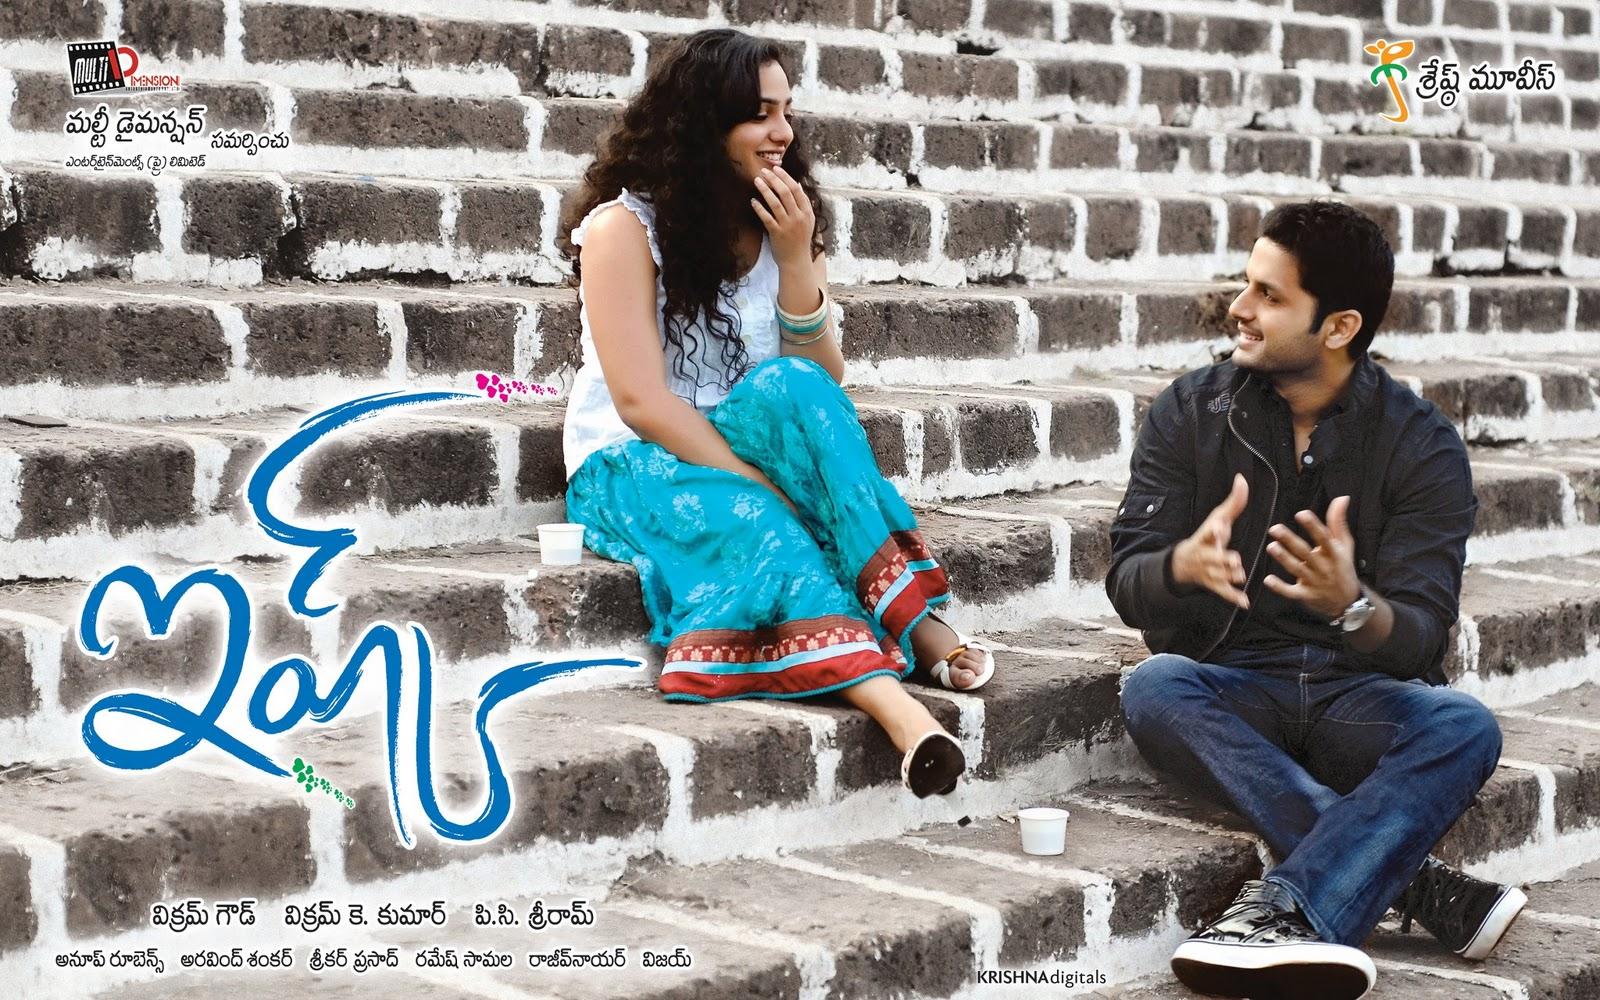 Indian Movie UpdatesTeluguHindiTamil Hot And Spicy Galleries WallpapersCinema Videos Nitin Nitya Menons Ishq New Wallpapers